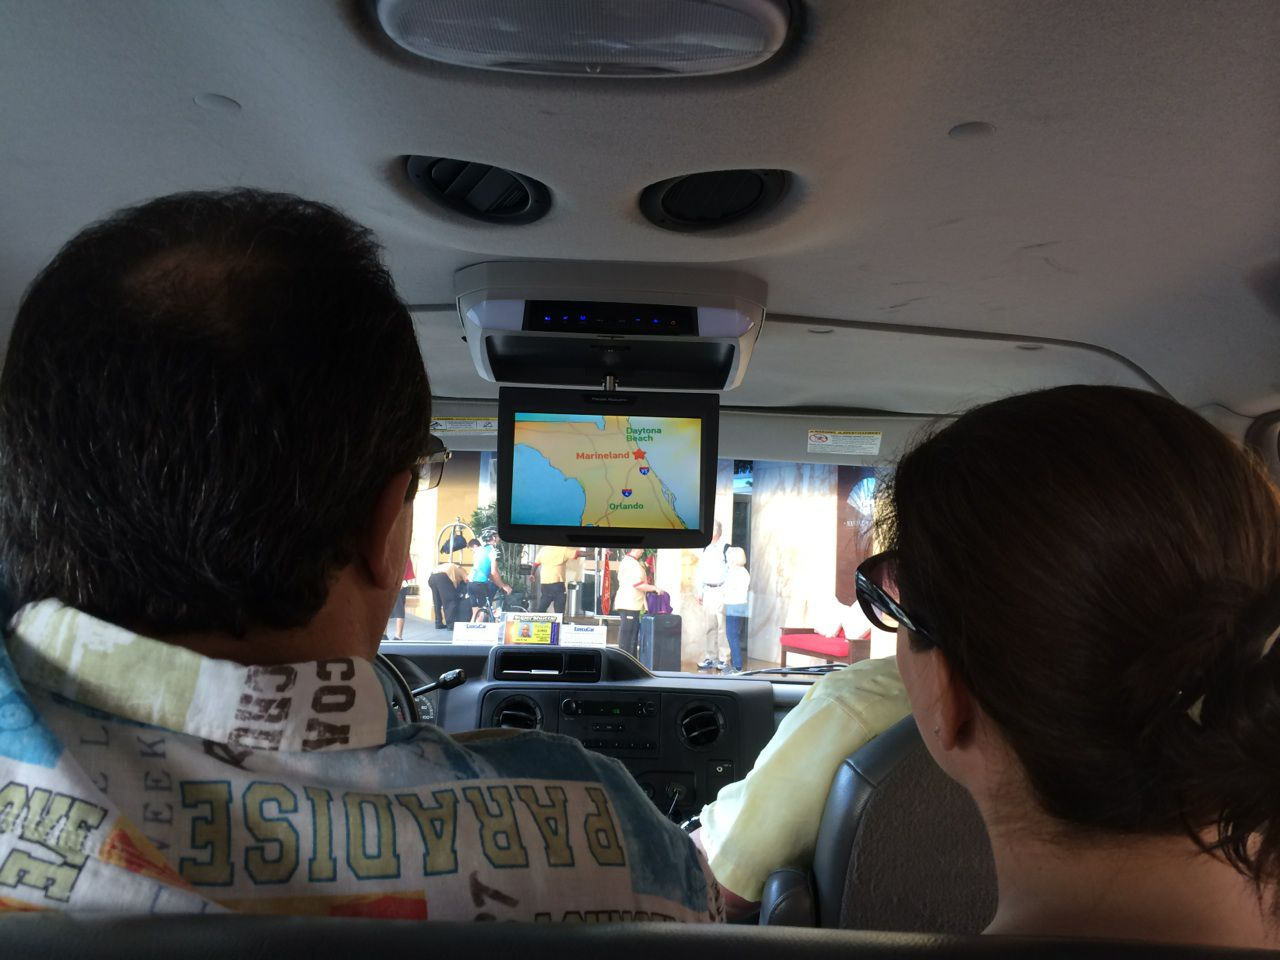 SuperShuttle shuttle CCTV advertisement